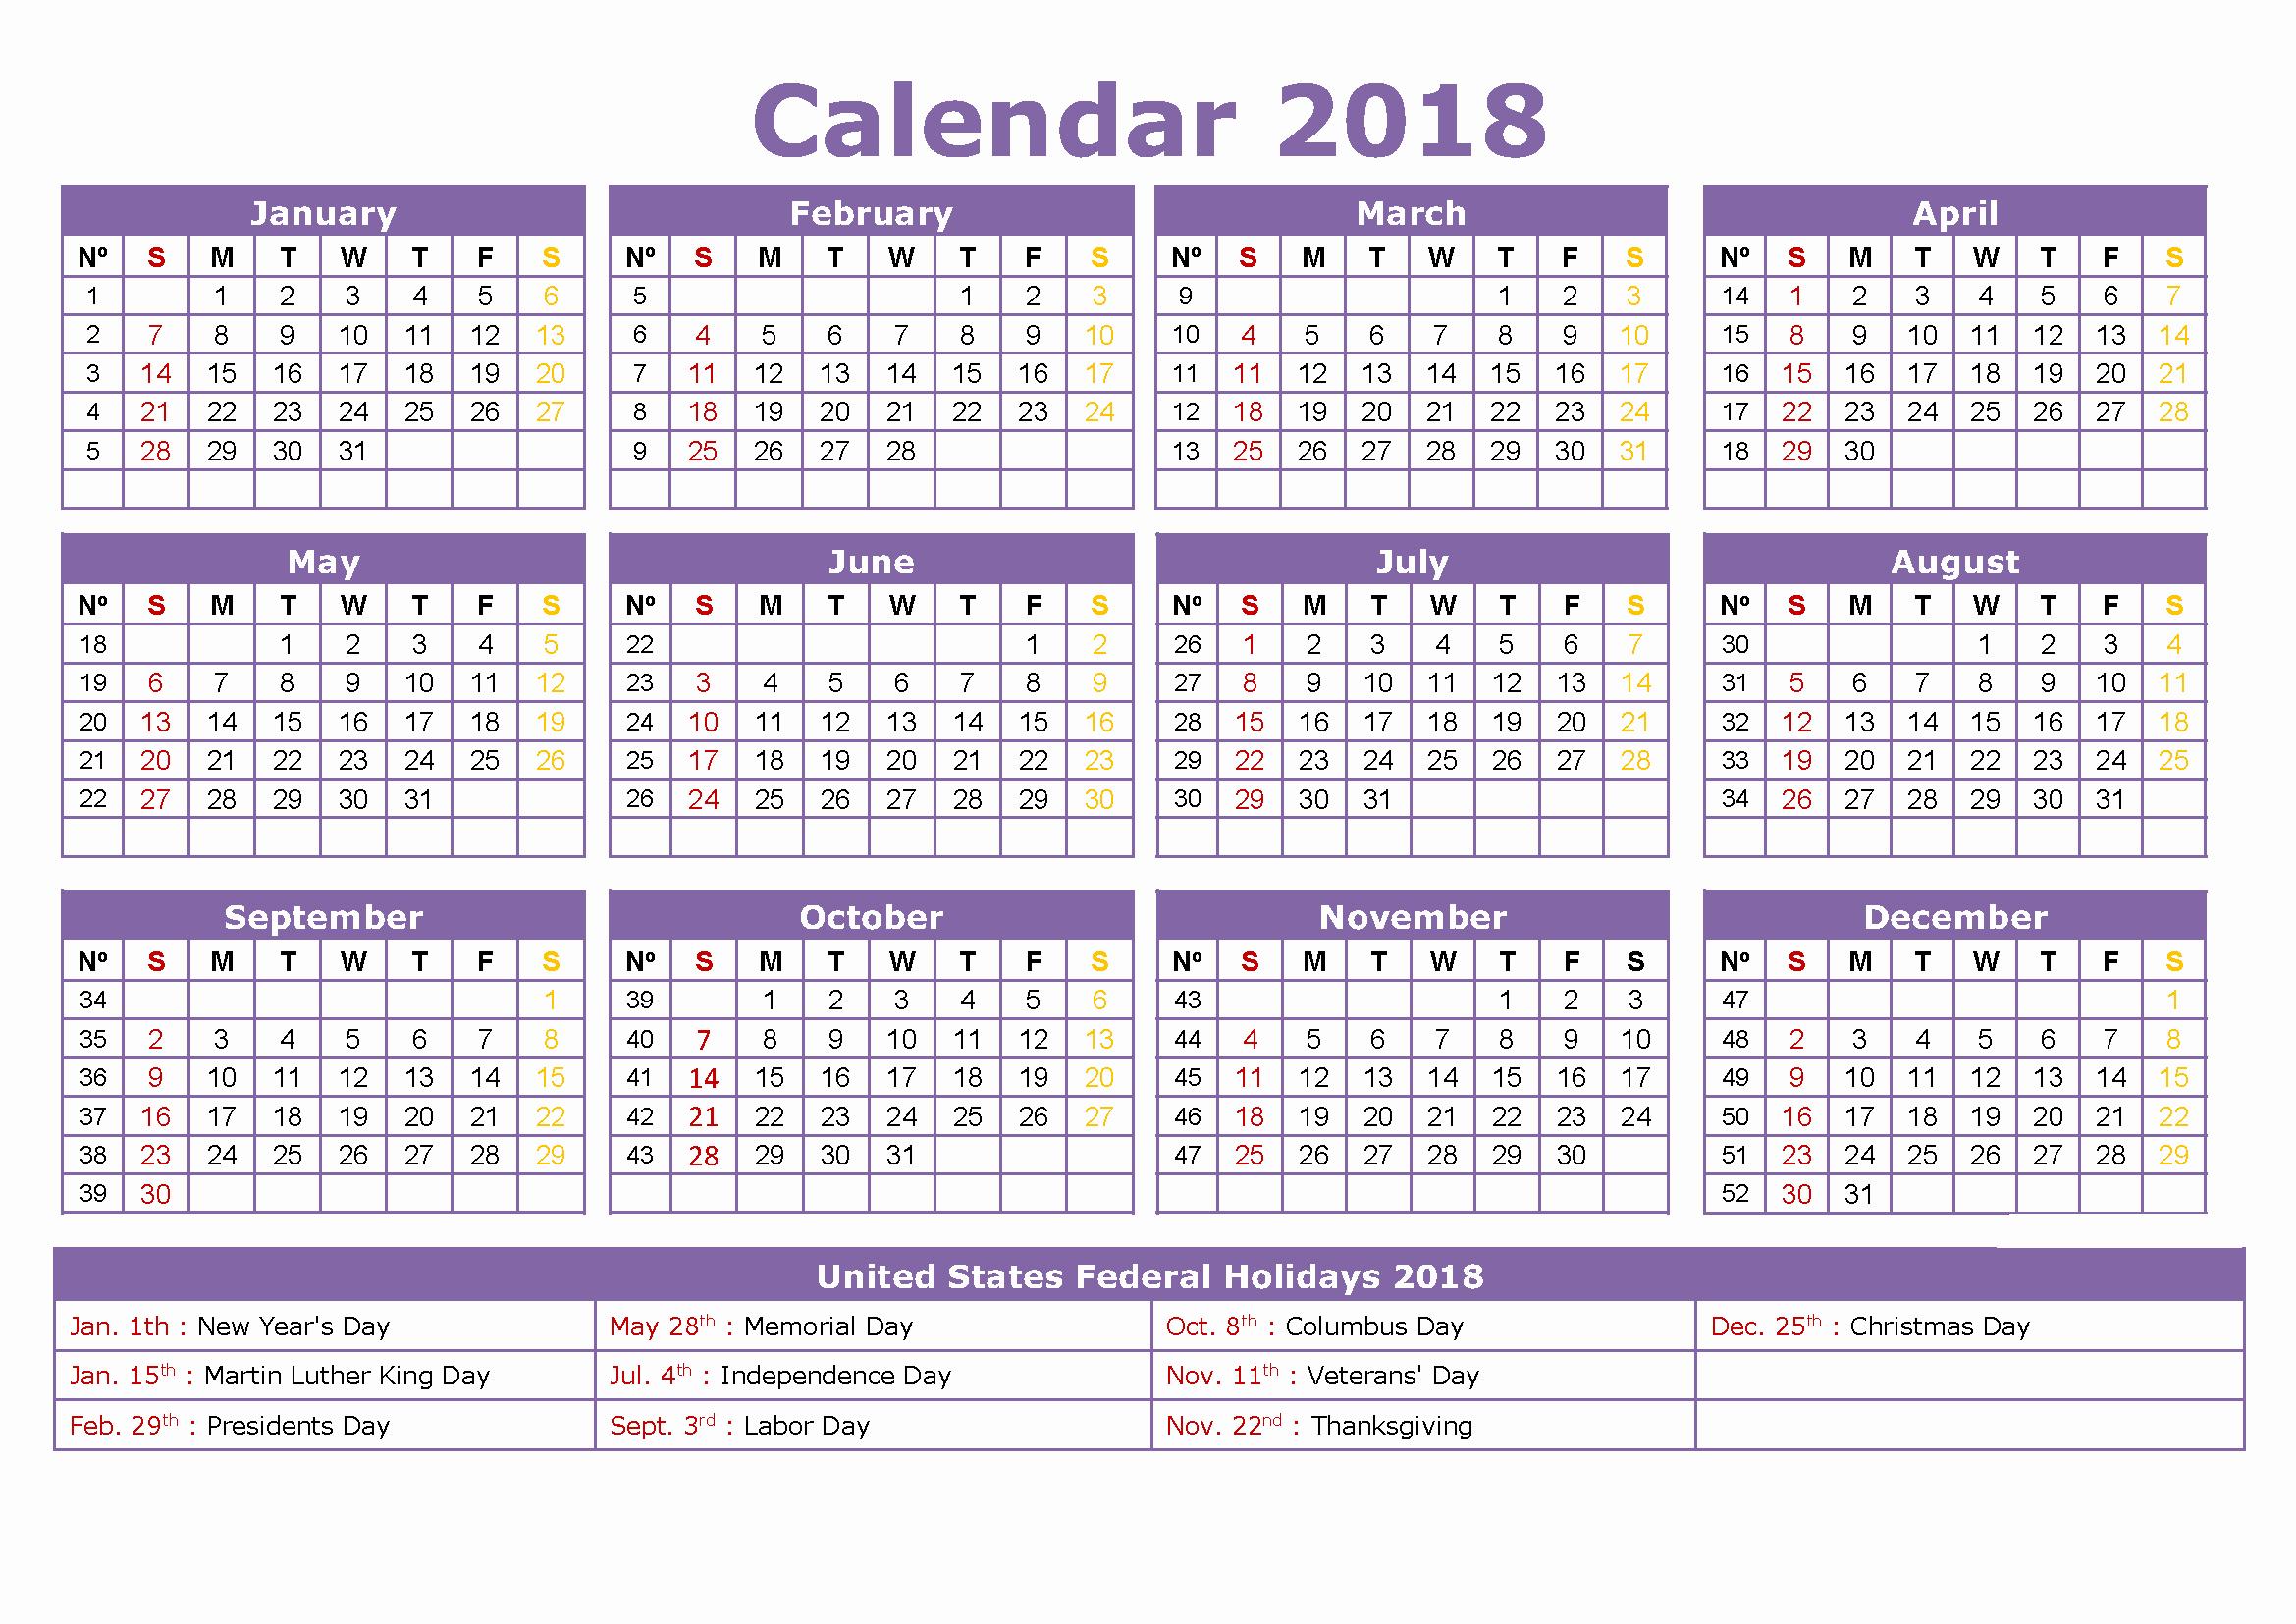 Calendar 2018 Printable with Holidays New 2018 Calendar with Holidays